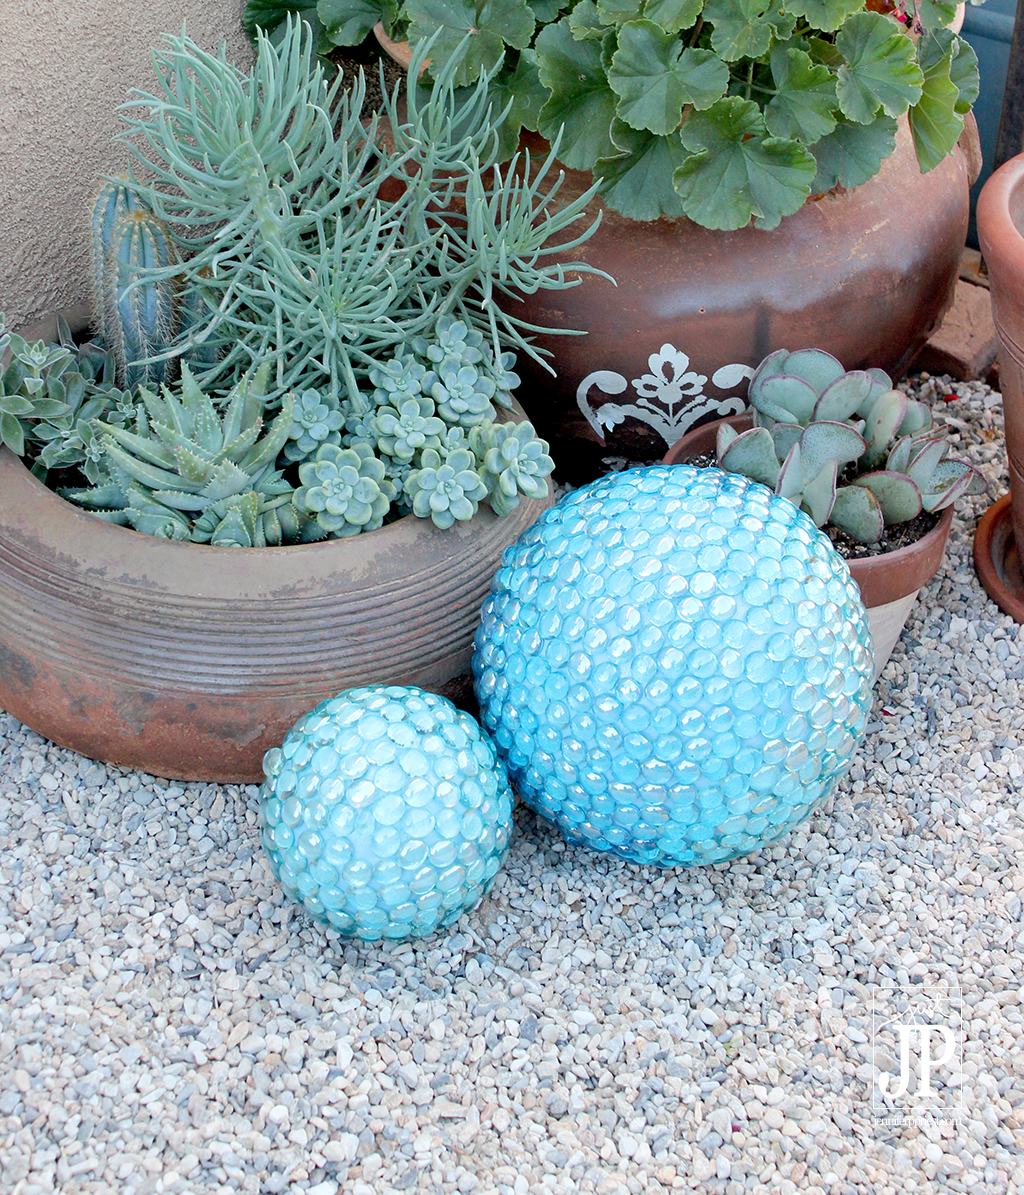 Decorative Mosaic Balls Diy Faux Gazing Ball For The Garden  Mosaics Gardens And Craft